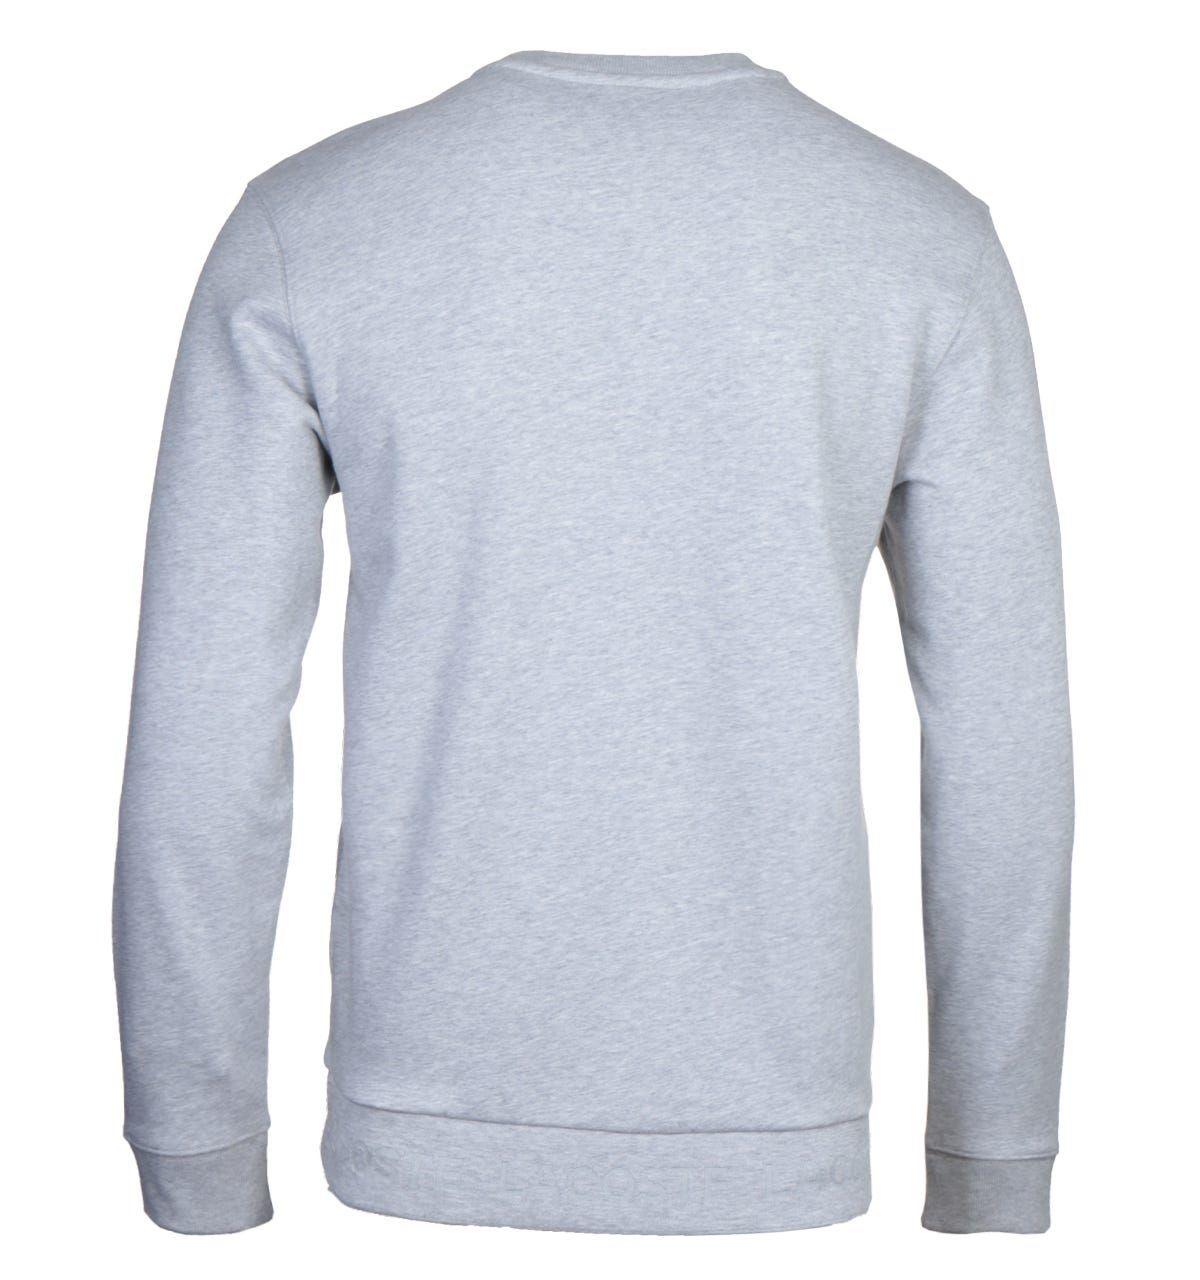 Lacoste Homme Grey Sweatshirt